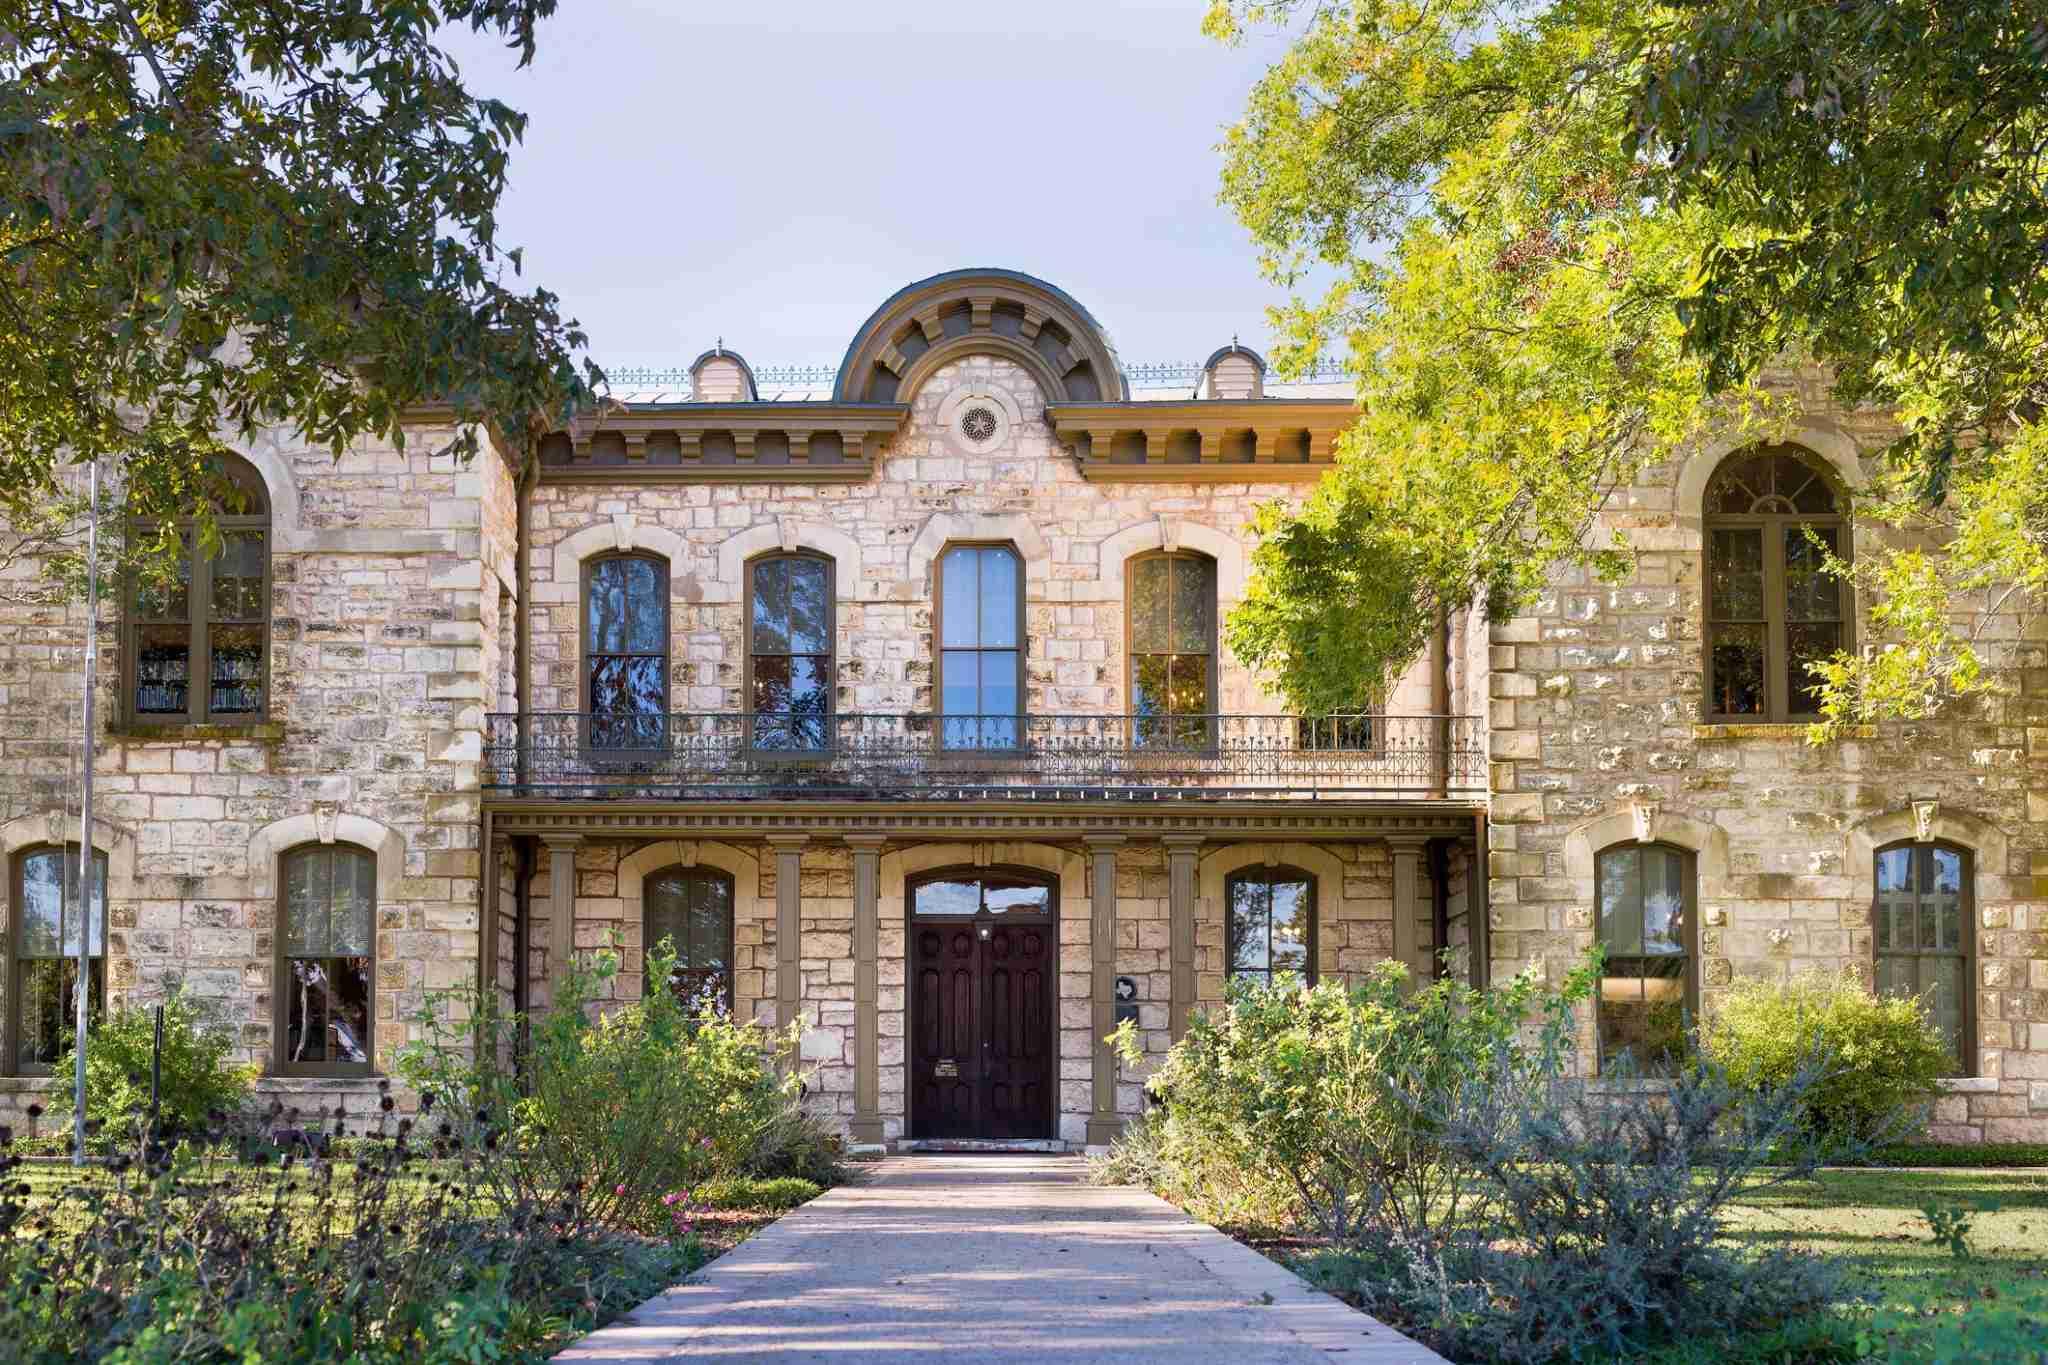 Fredericksburg, Texas (Photo by Dean_Fikar/Getty Image)